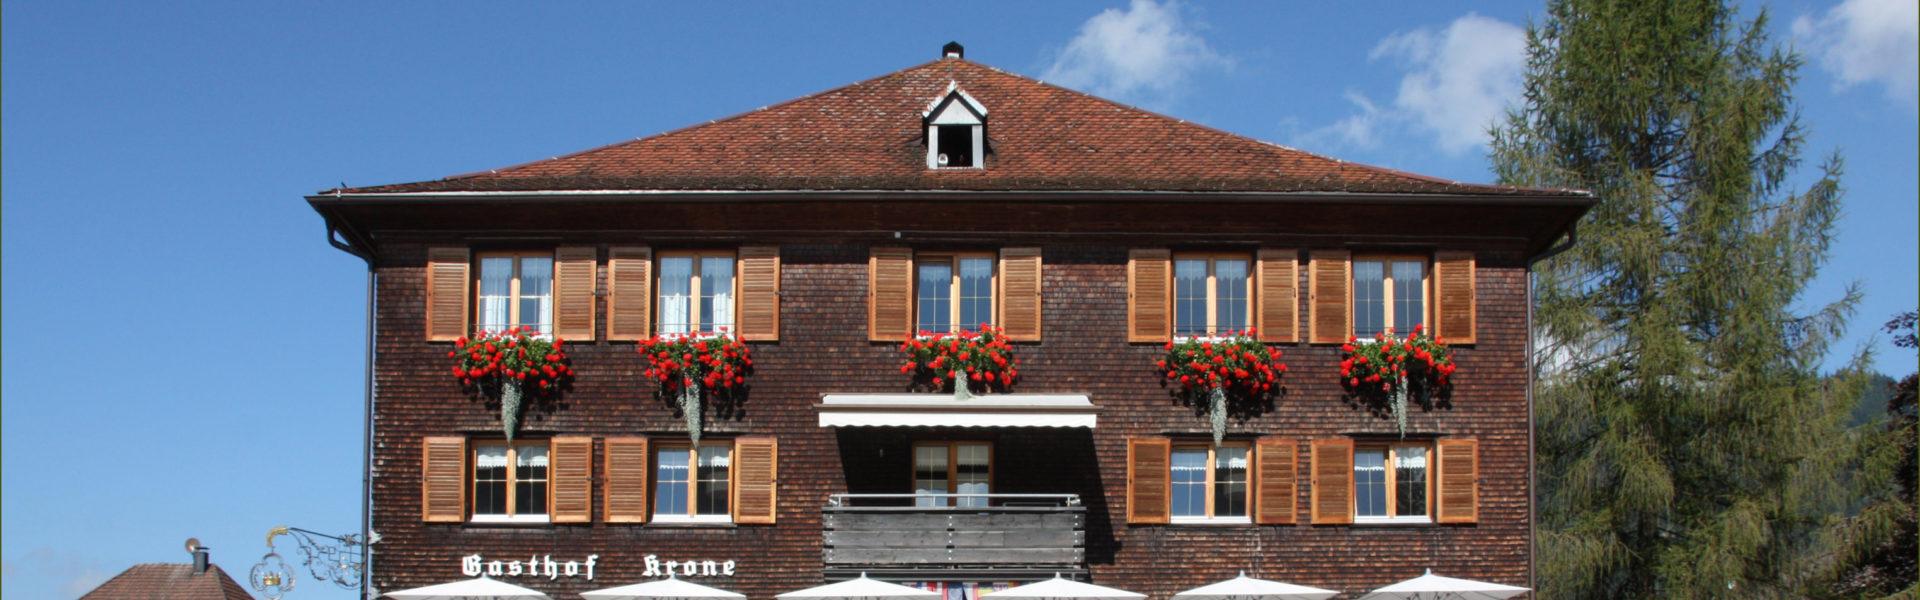 Hotel Gasthof Krone, Golfhotel Hittisau(c)Hotel Krone Hittisau